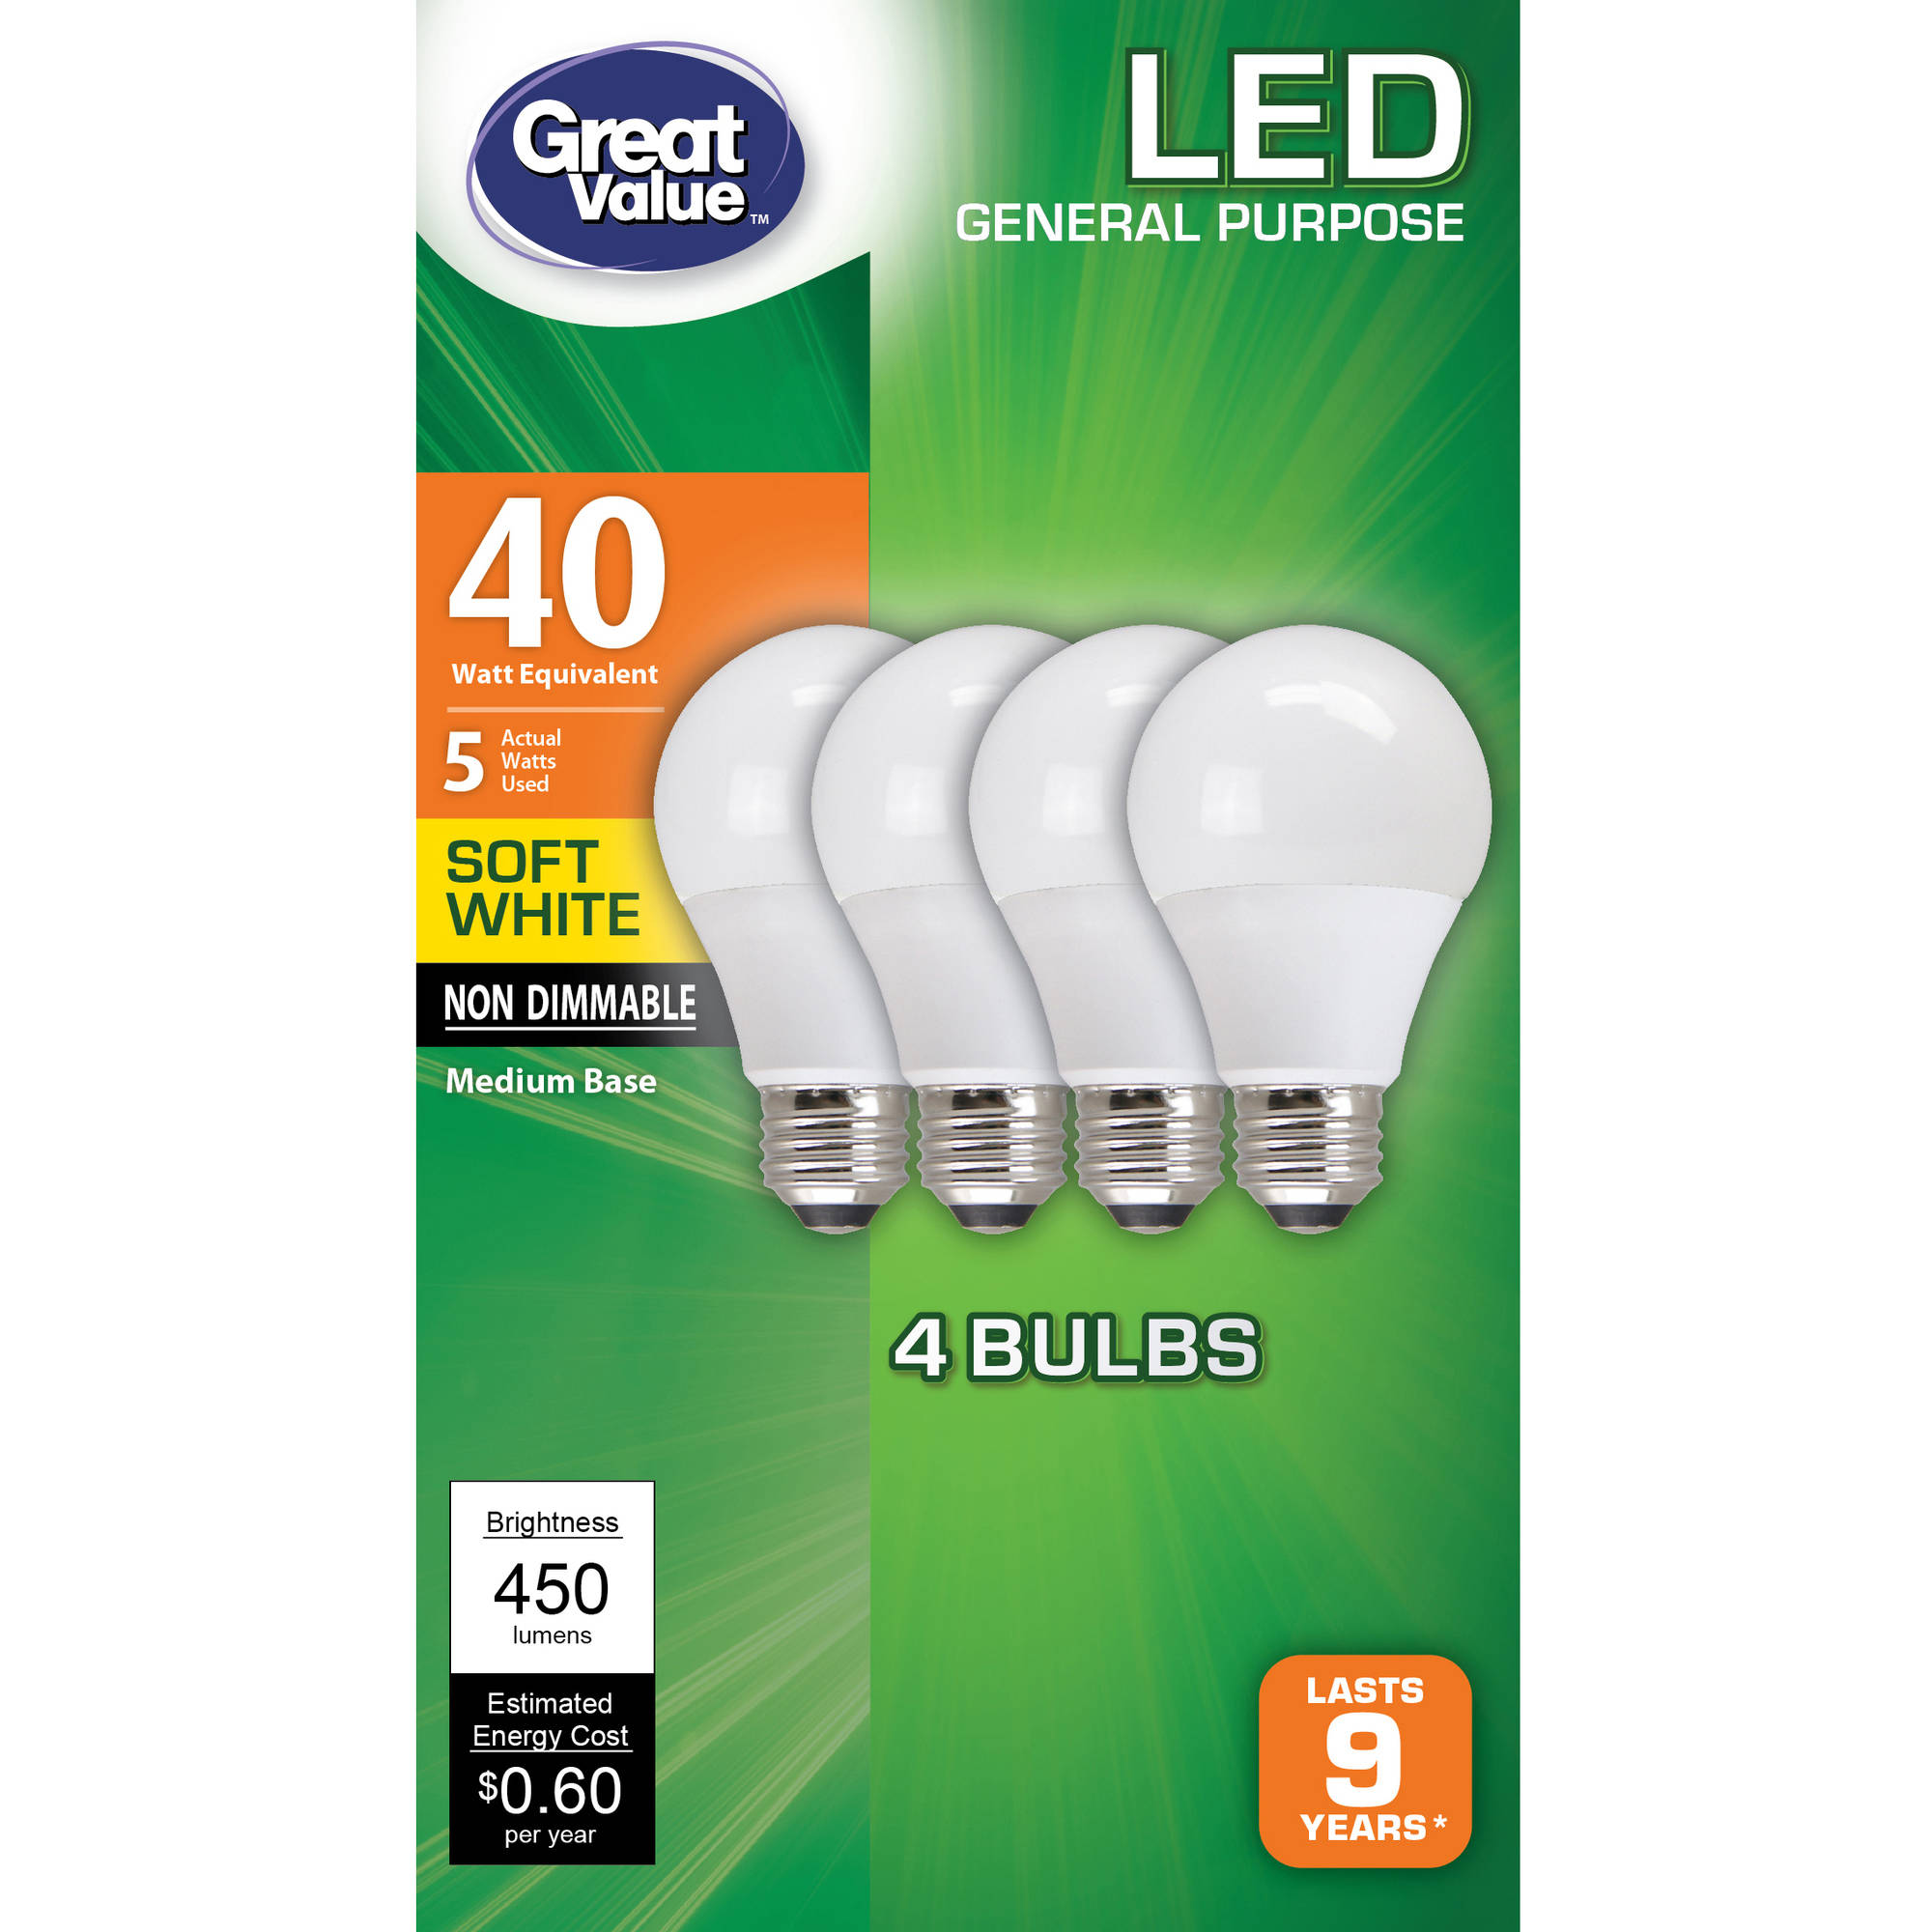 Great Value Led Light Bulbs 5w 40w Equivalent Soft White 4 Count Walmart Com